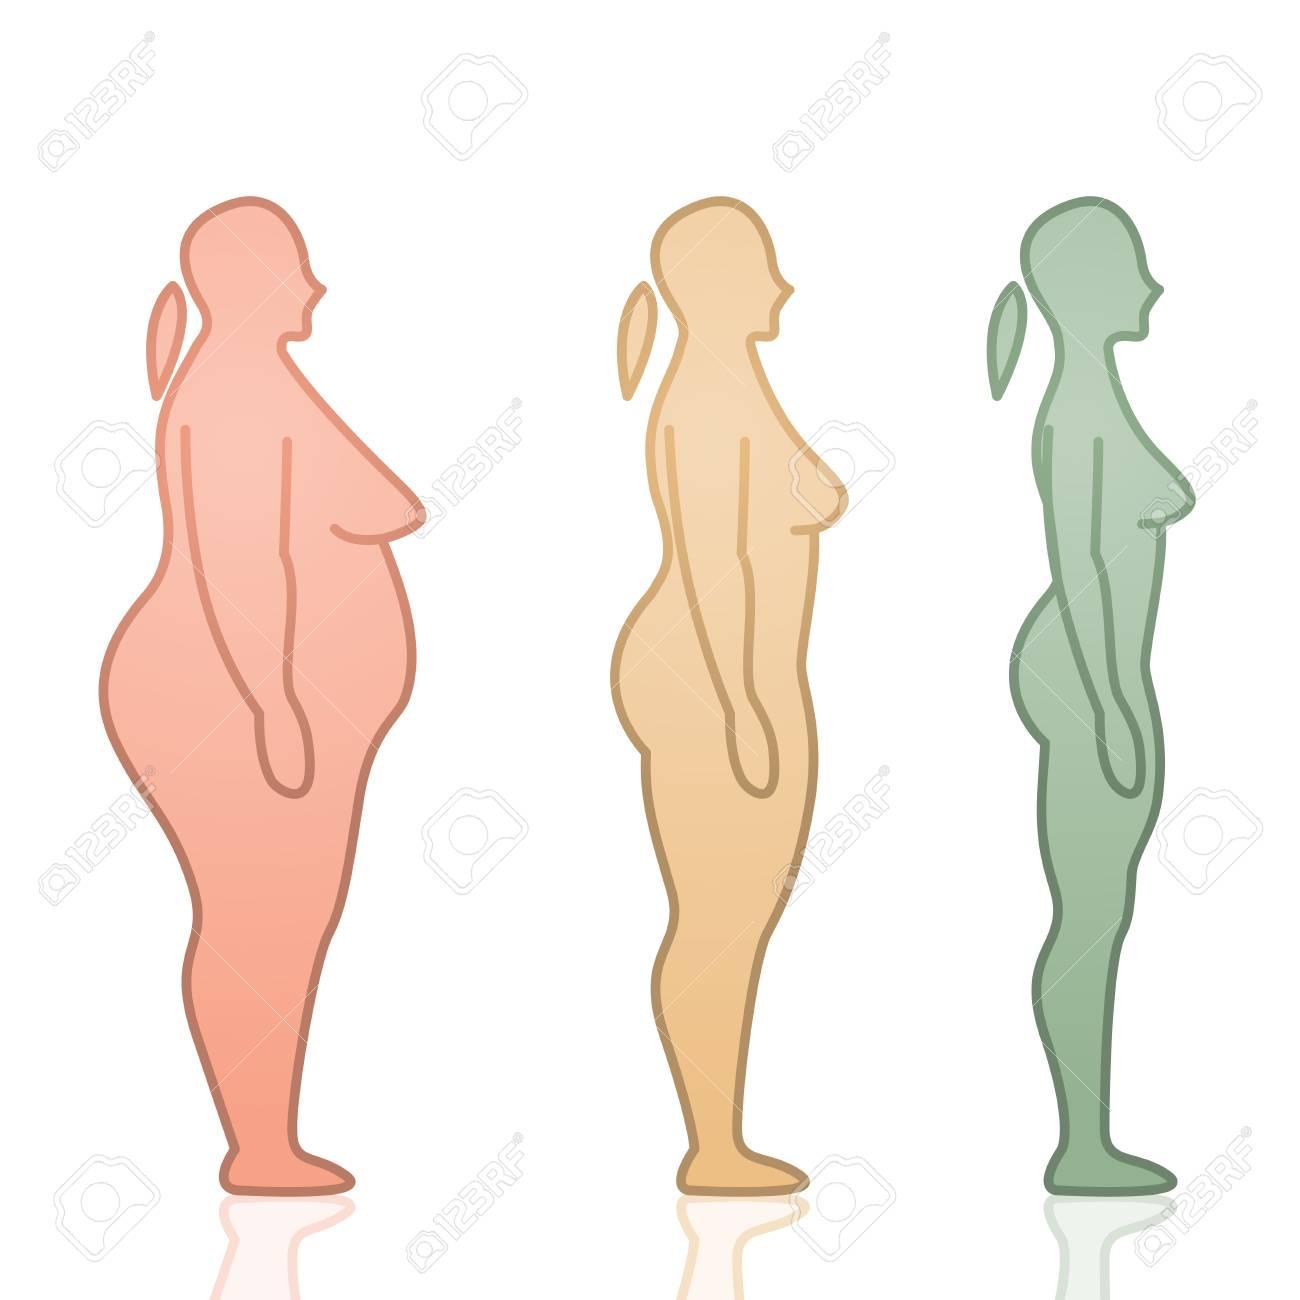 Ilustración De Vector De Gordo A Flaco Femenino Siluetas Icono Plana Diseño